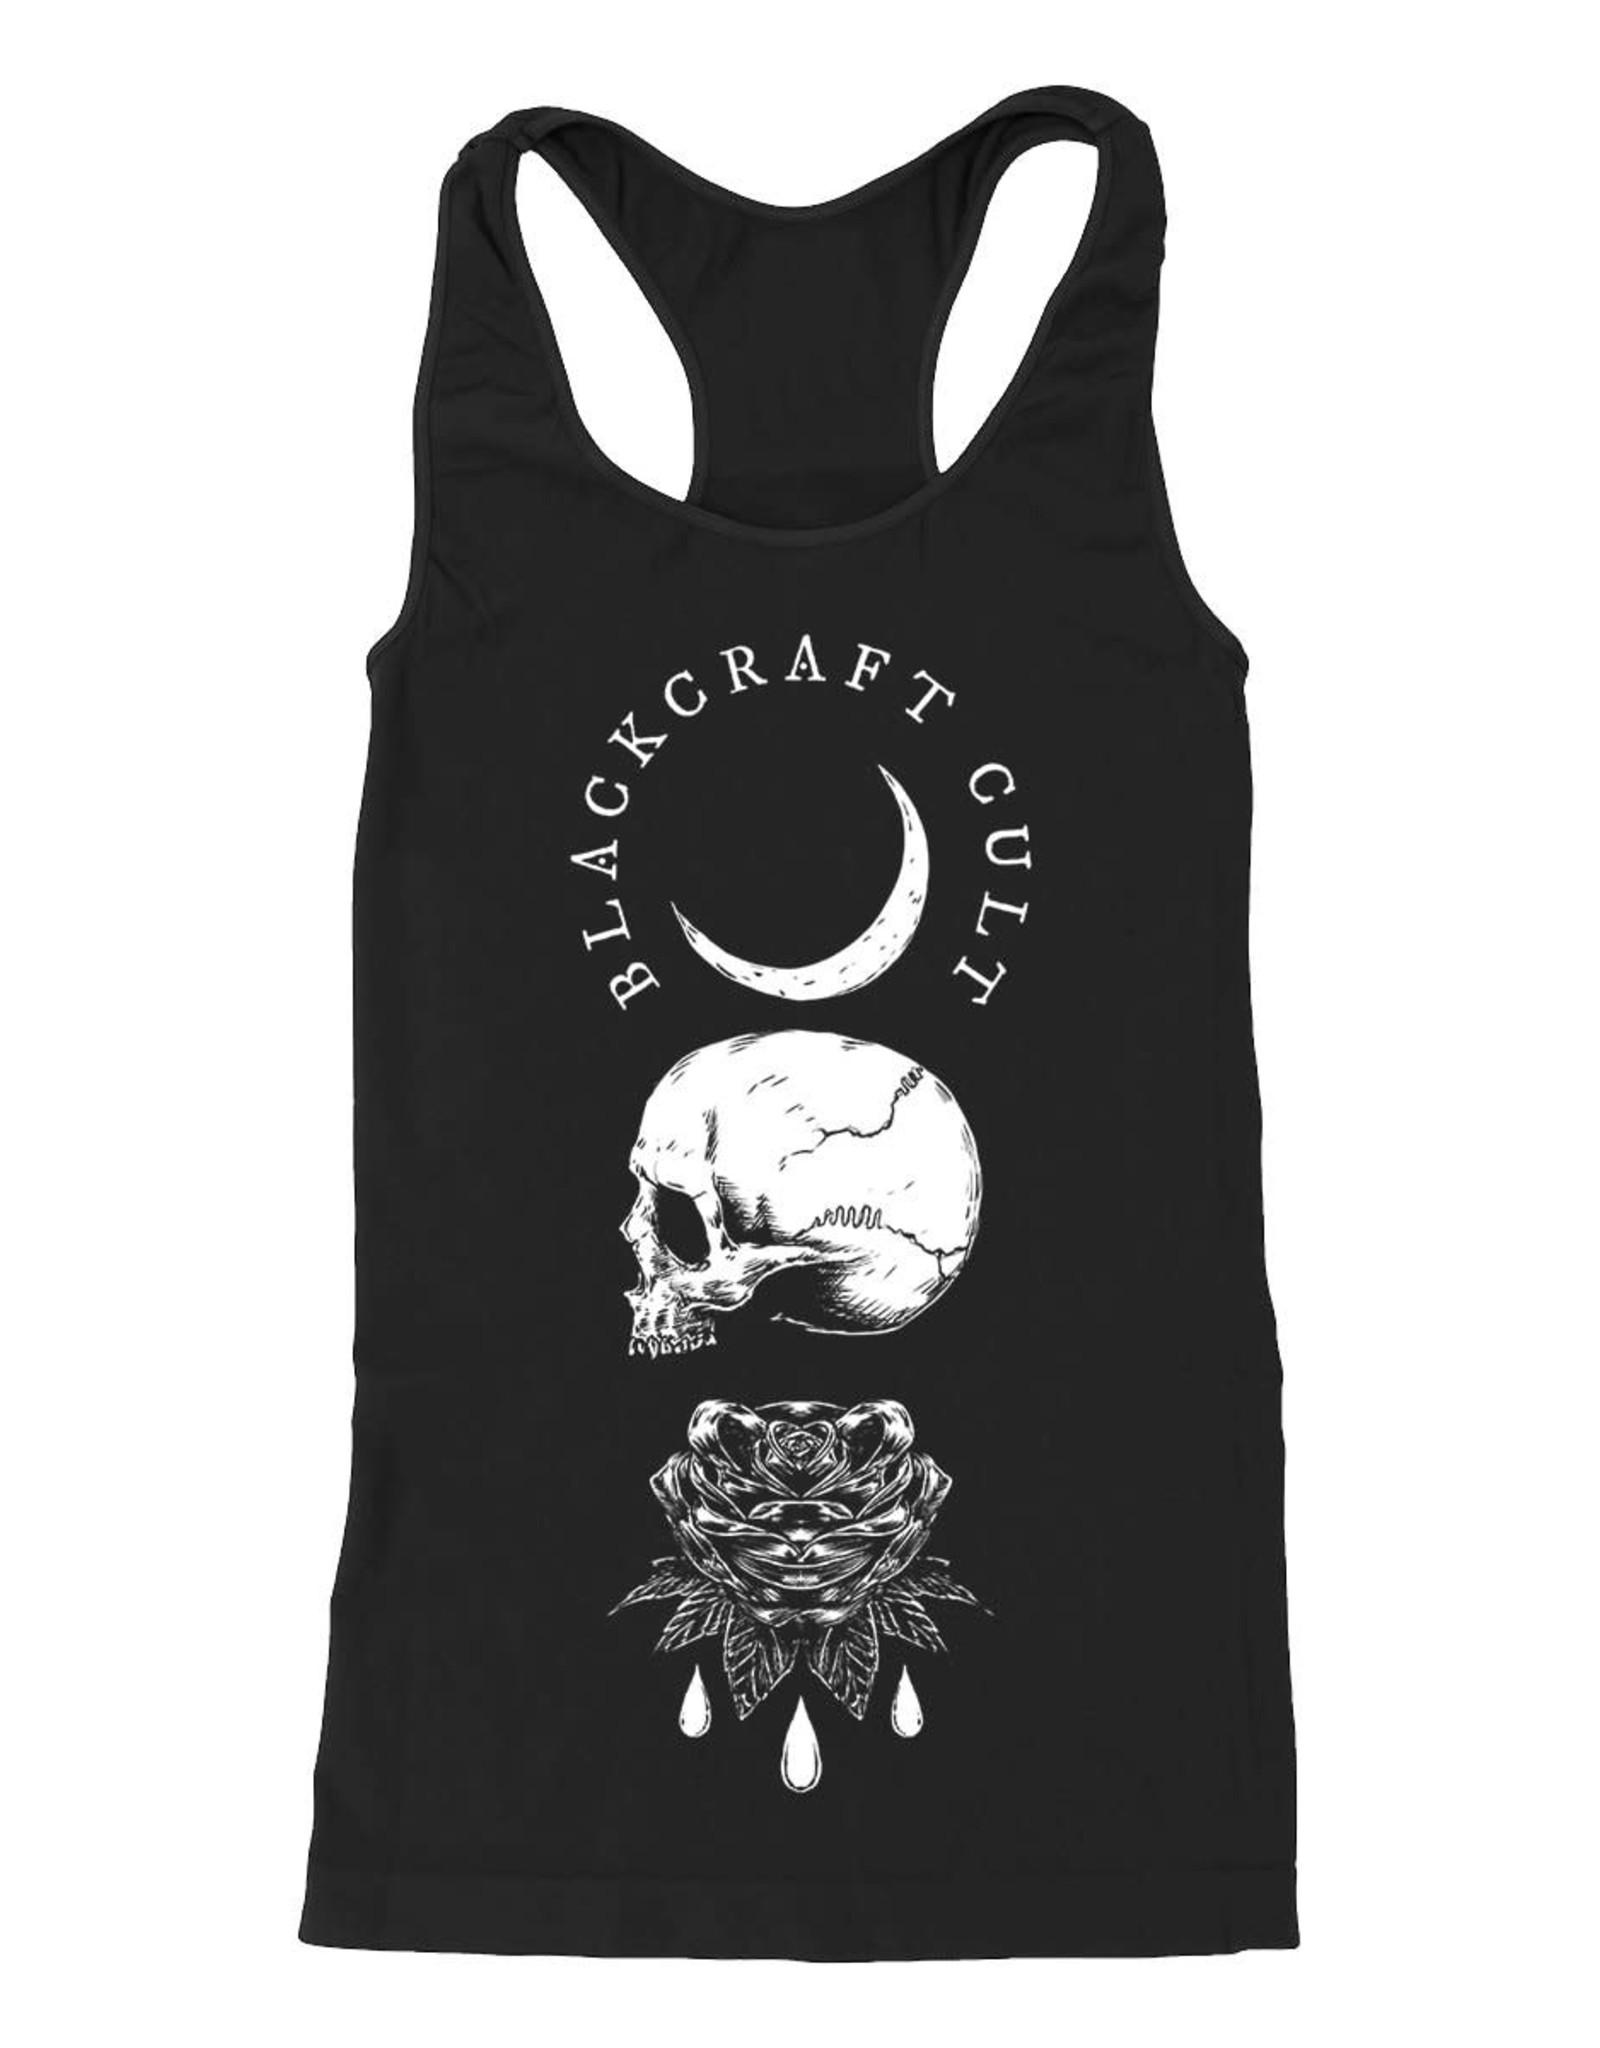 BLACKCRAFT CULT - Spirits Of The Dead Racerback Tank Top